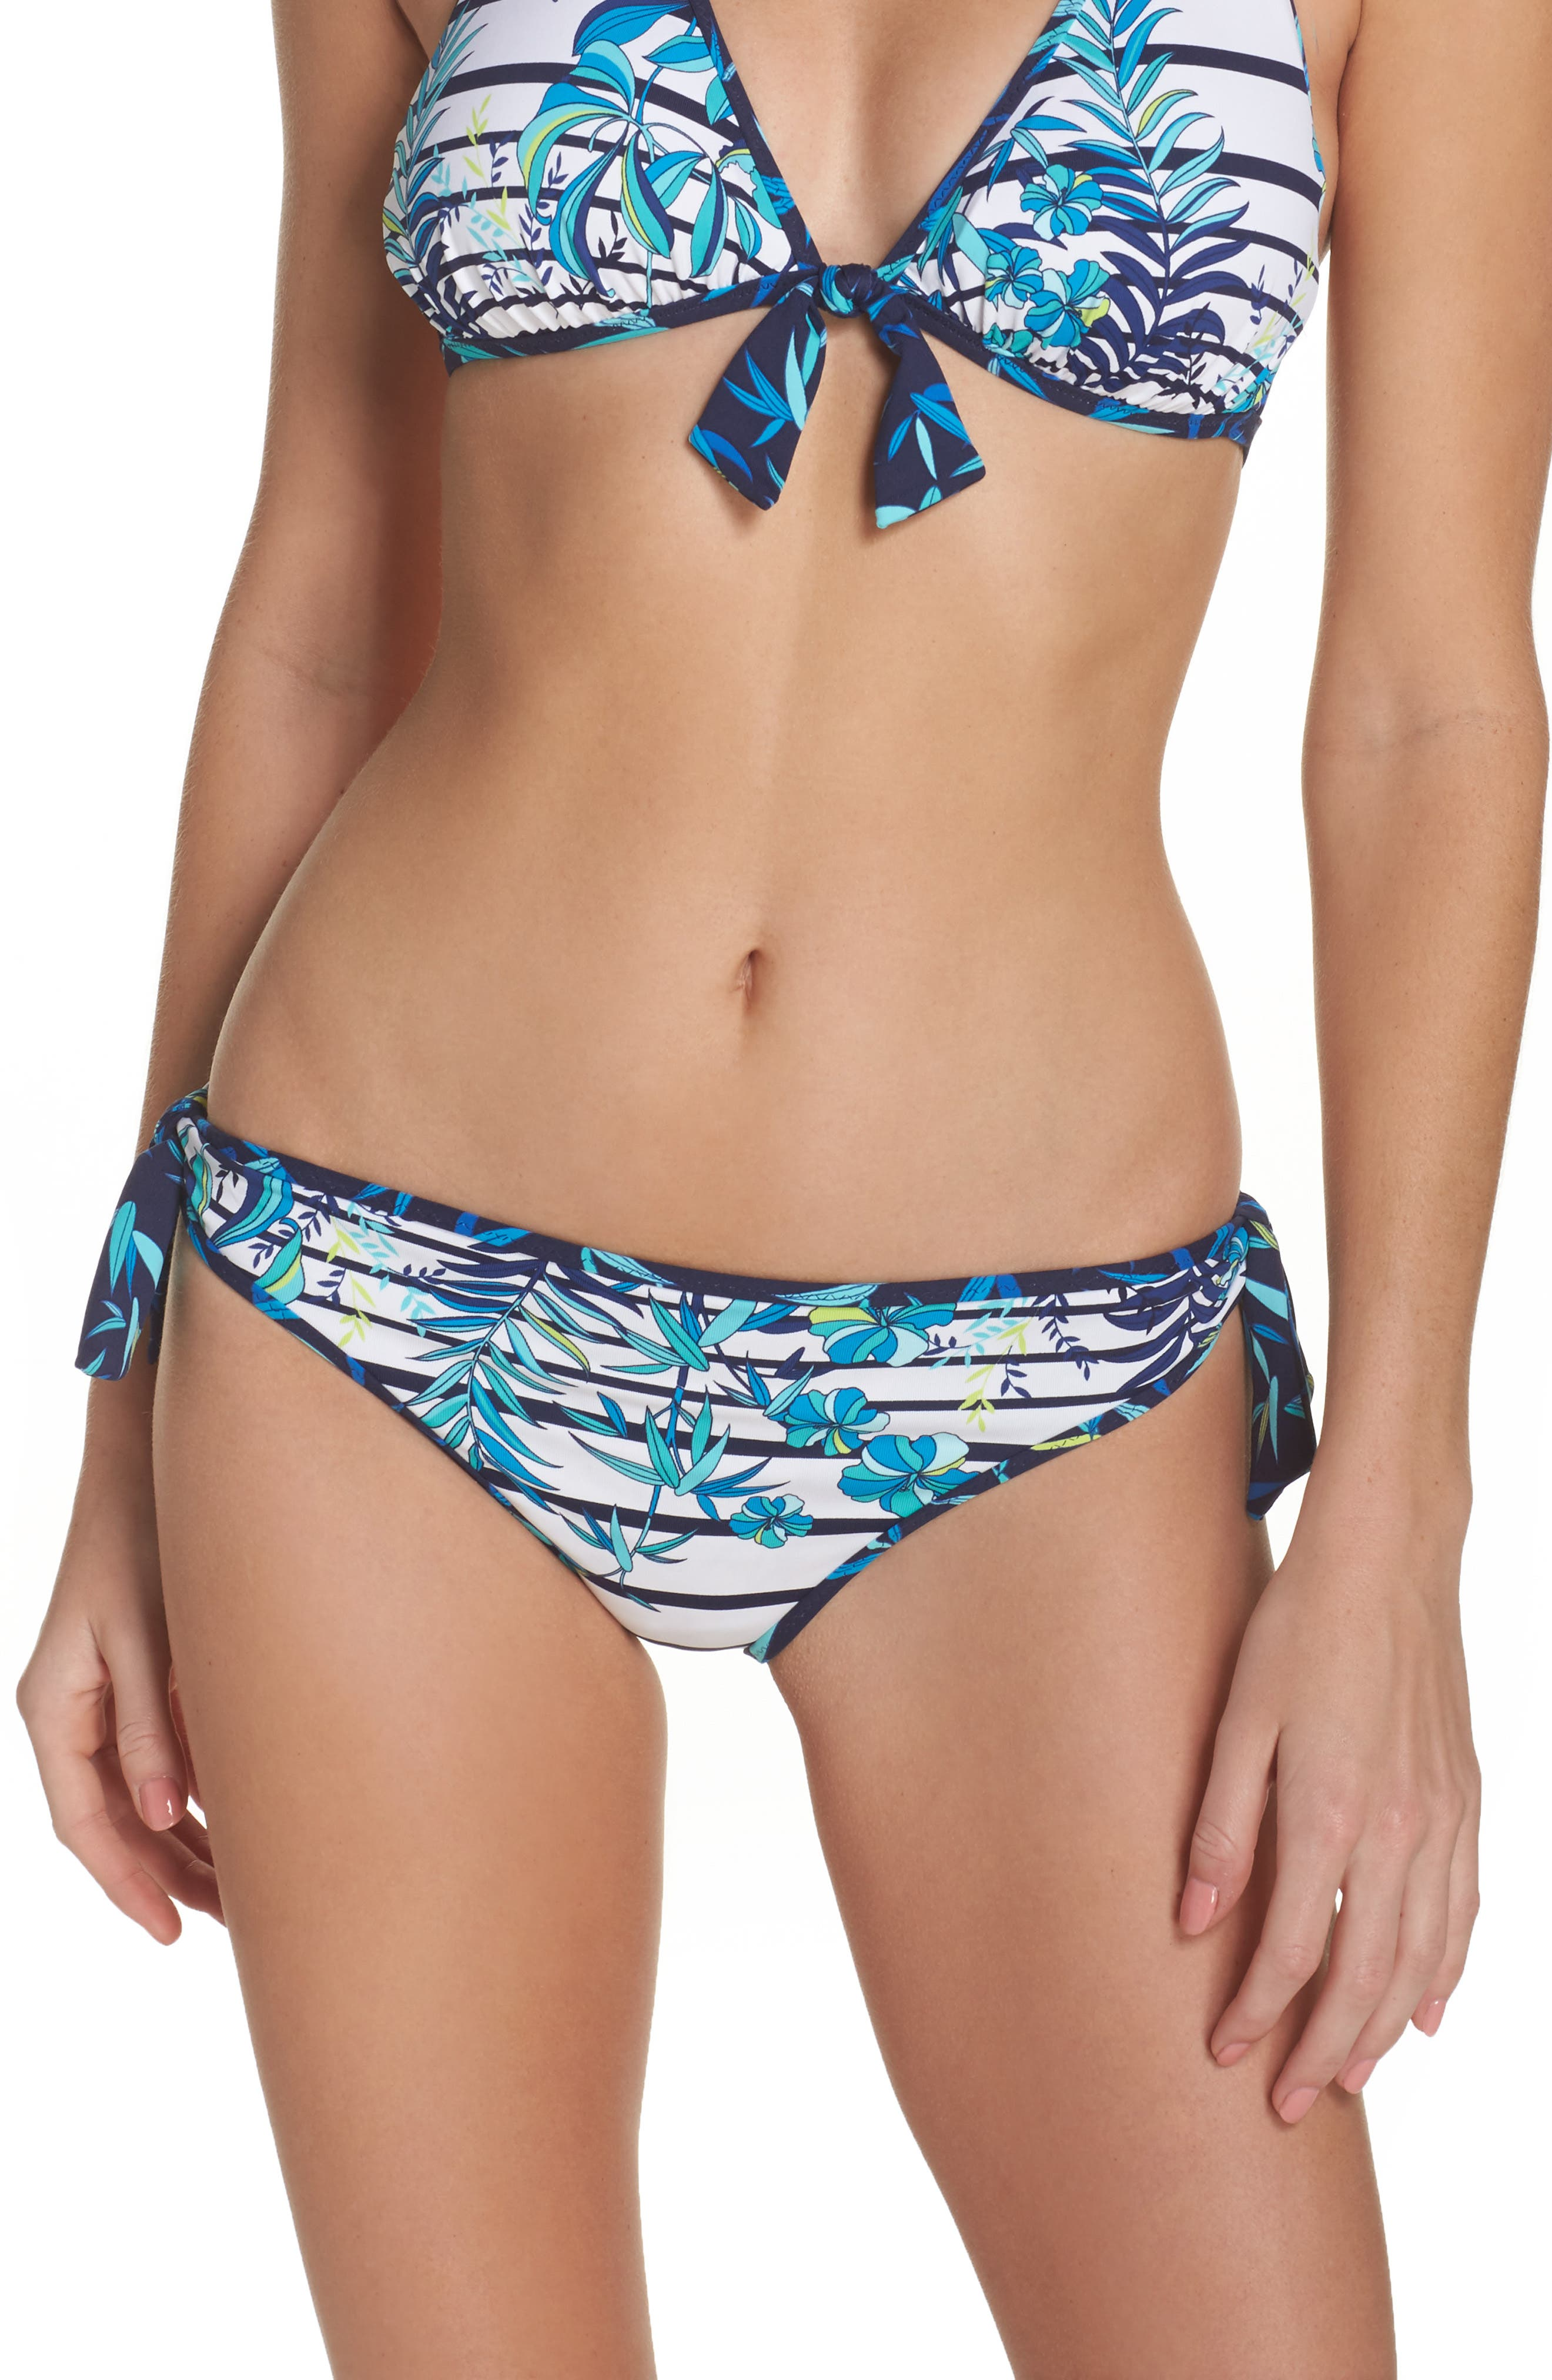 Tropical Swirl Reversible Bikini Bottoms,                         Main,                         color, Blue/ White